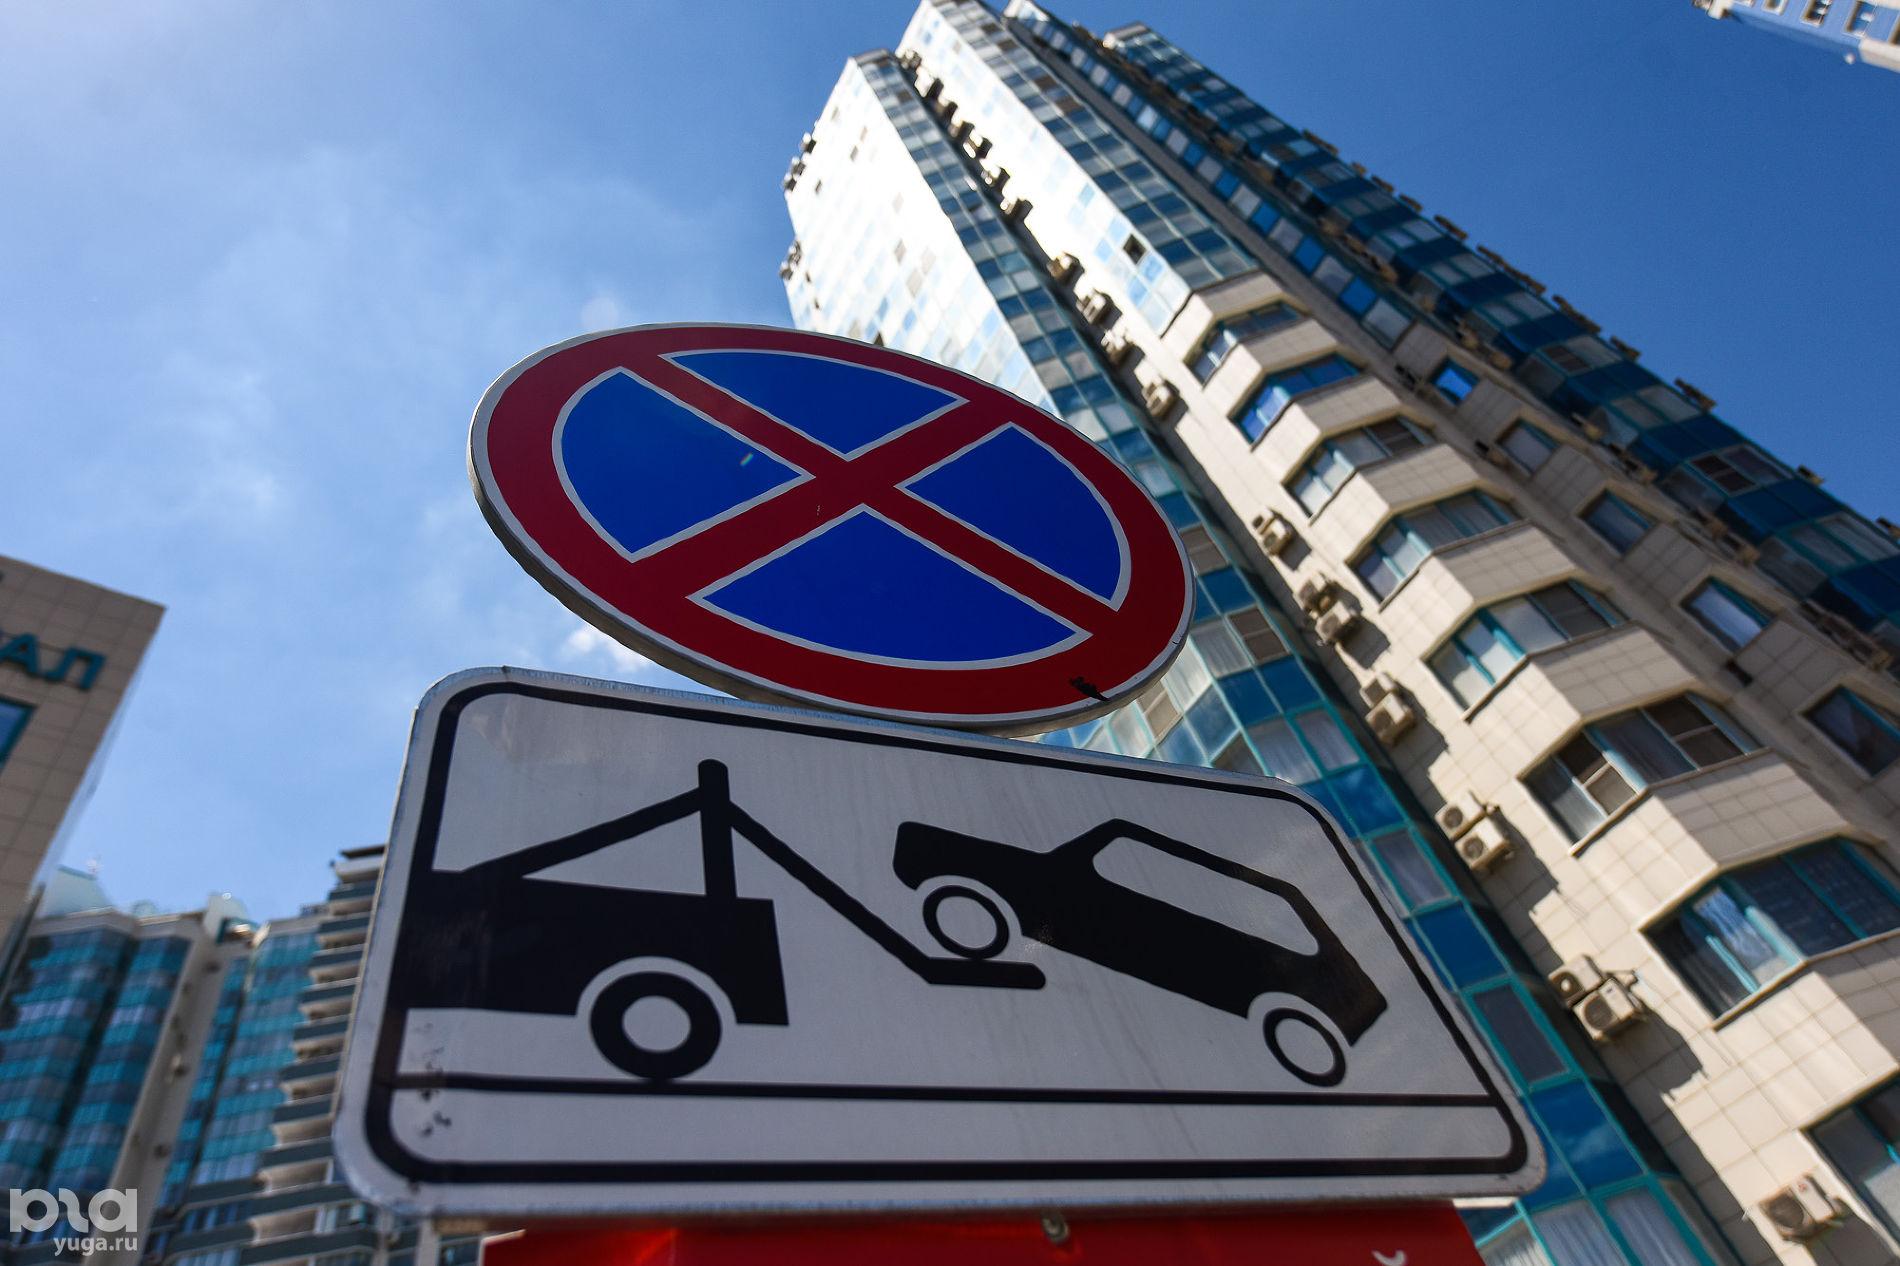 На шести улицах Краснодара запретят остановку машин